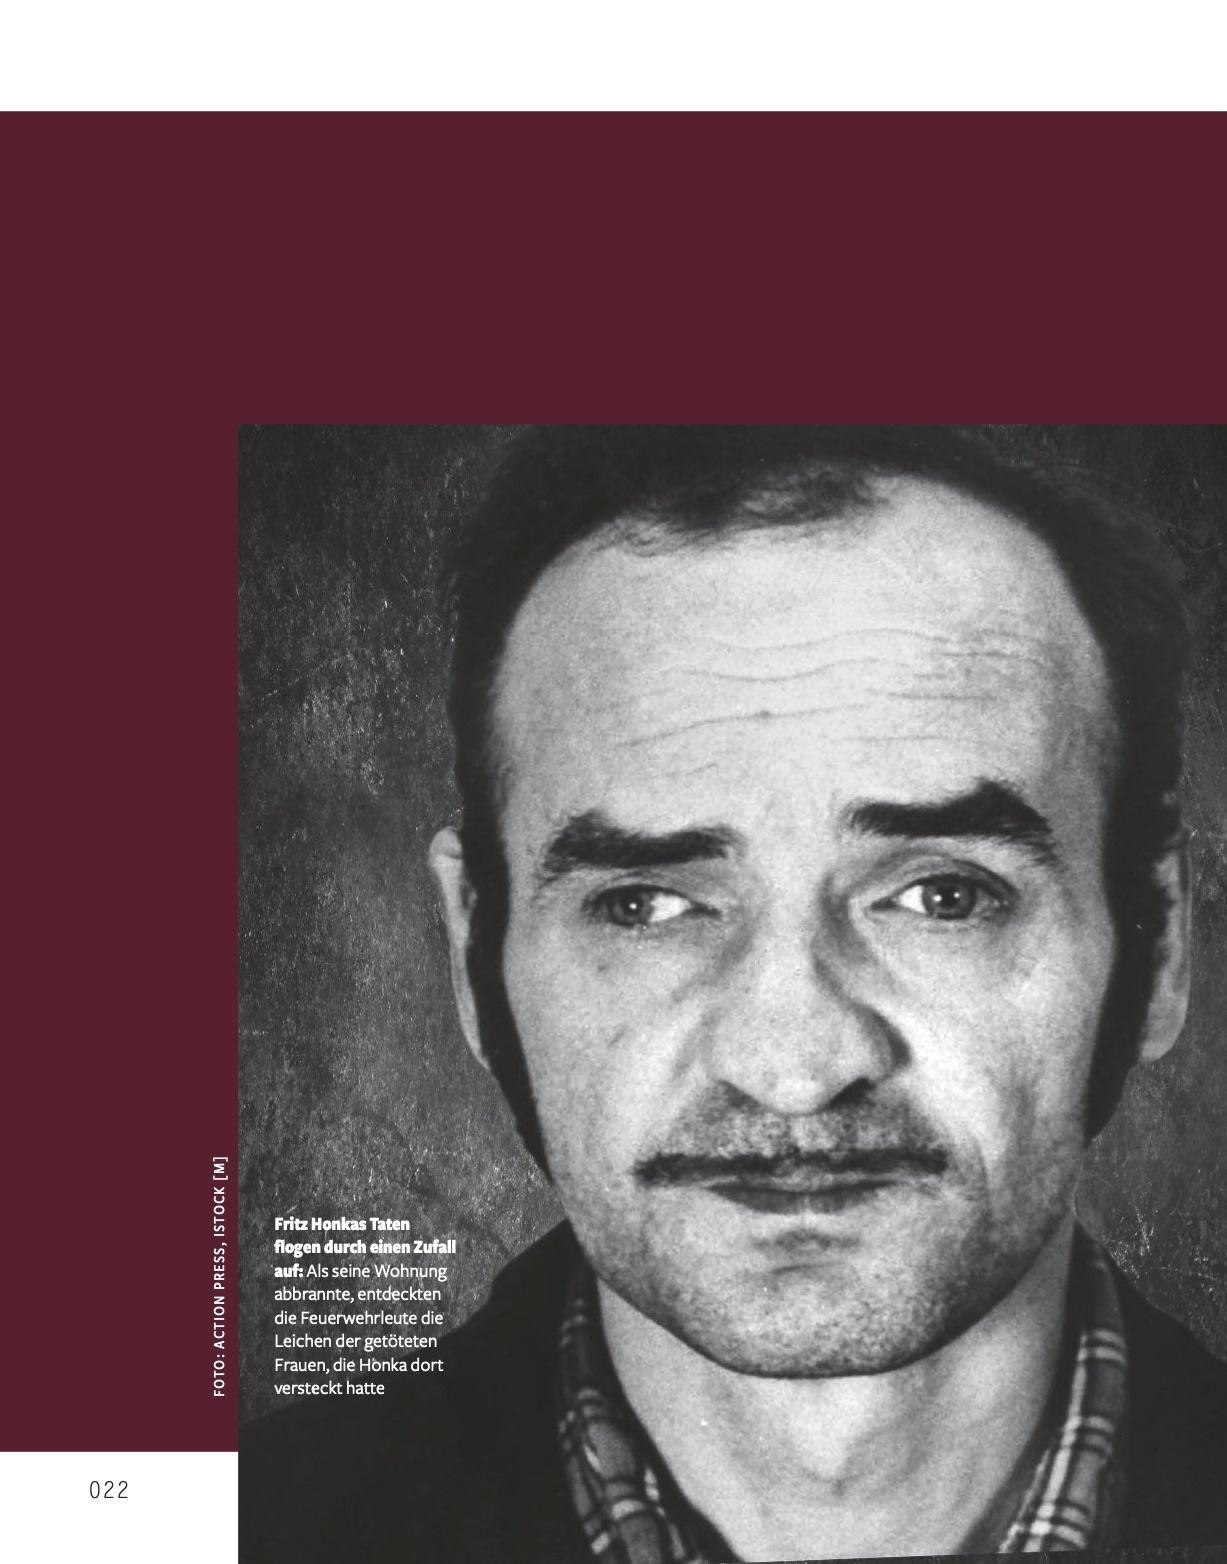 FOCUS Echte Verbrechen FOCUS Echte Verbrechen Nr. 07/2021